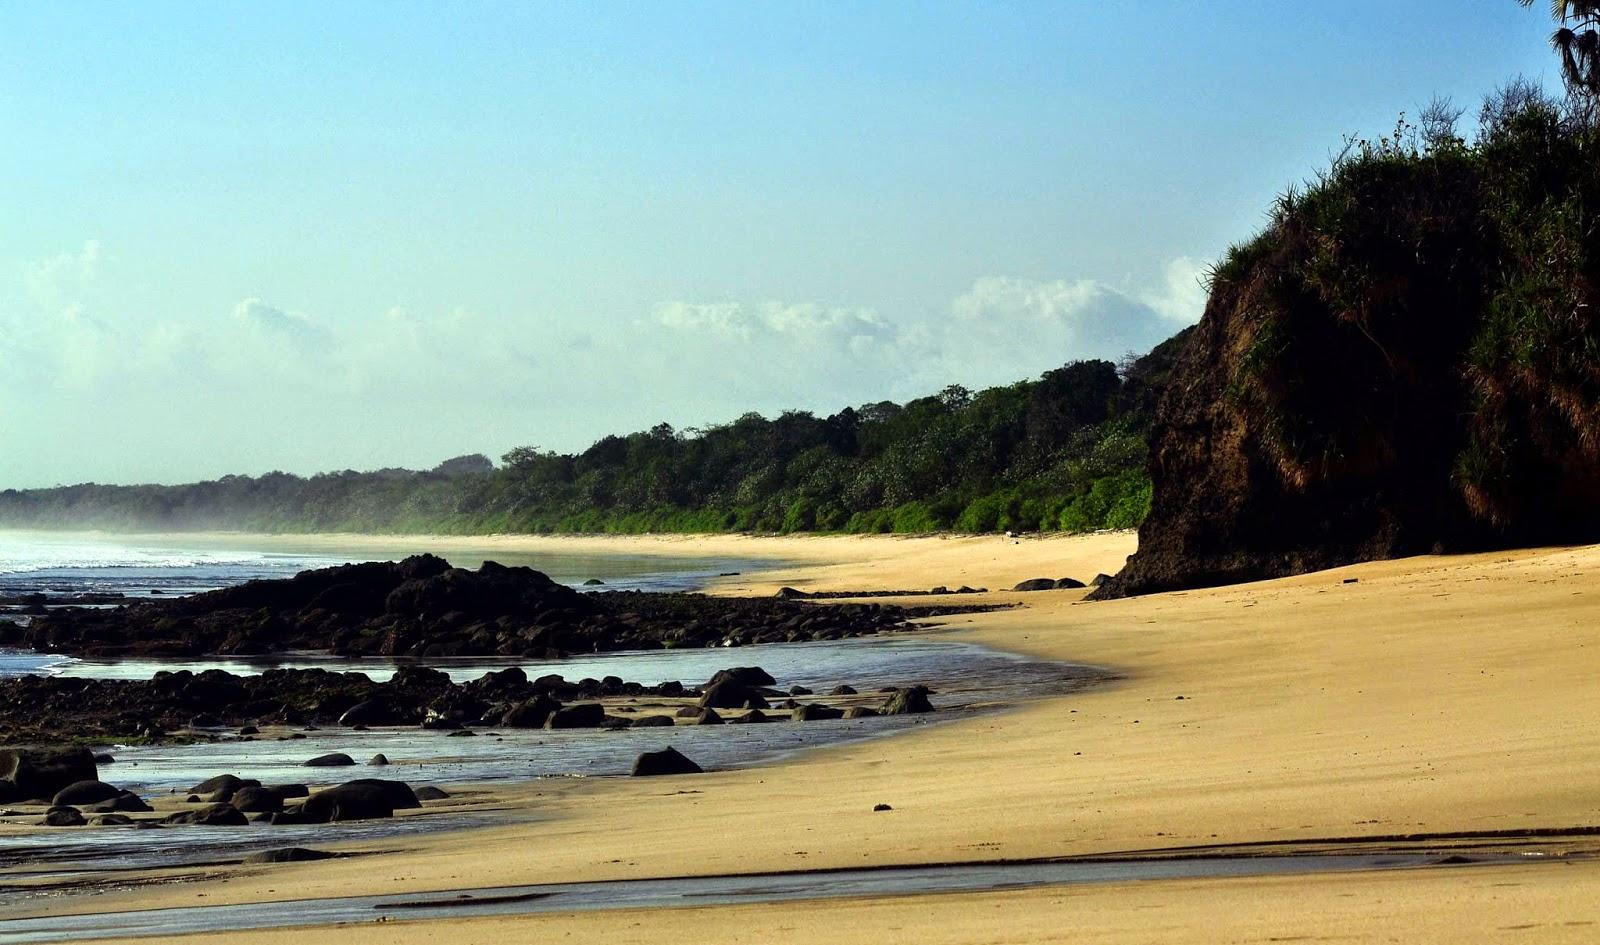 Keindahan Alam Ujung Timur Pulau Jawa October 2014 Pantai Trianggulasi